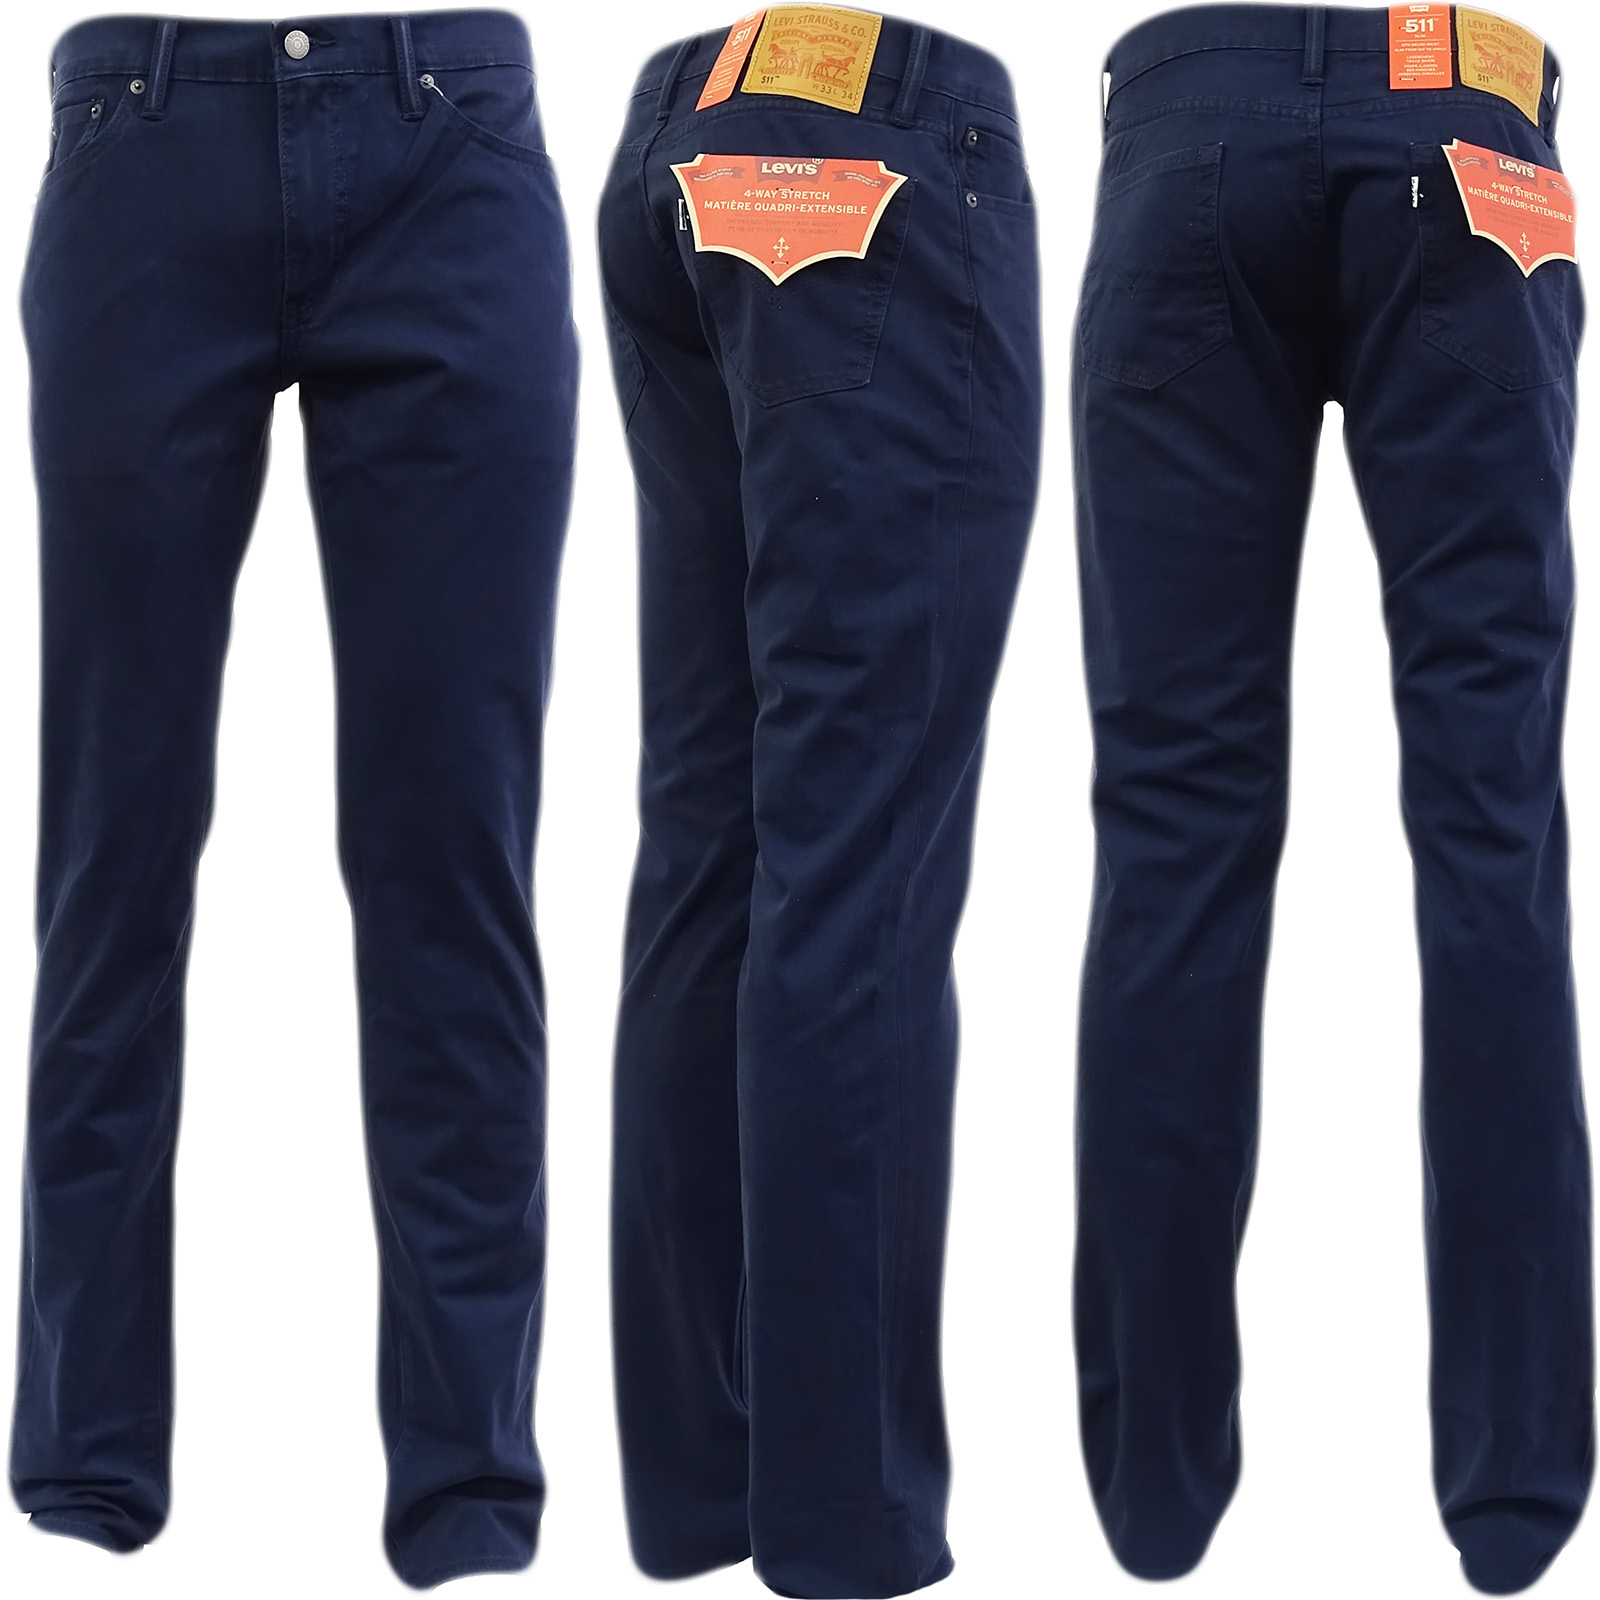 1a739c66eb8 Levi s 511 Slim Fit Men s Jeans Nightwatch Blue Bistro W34 L34 for ...